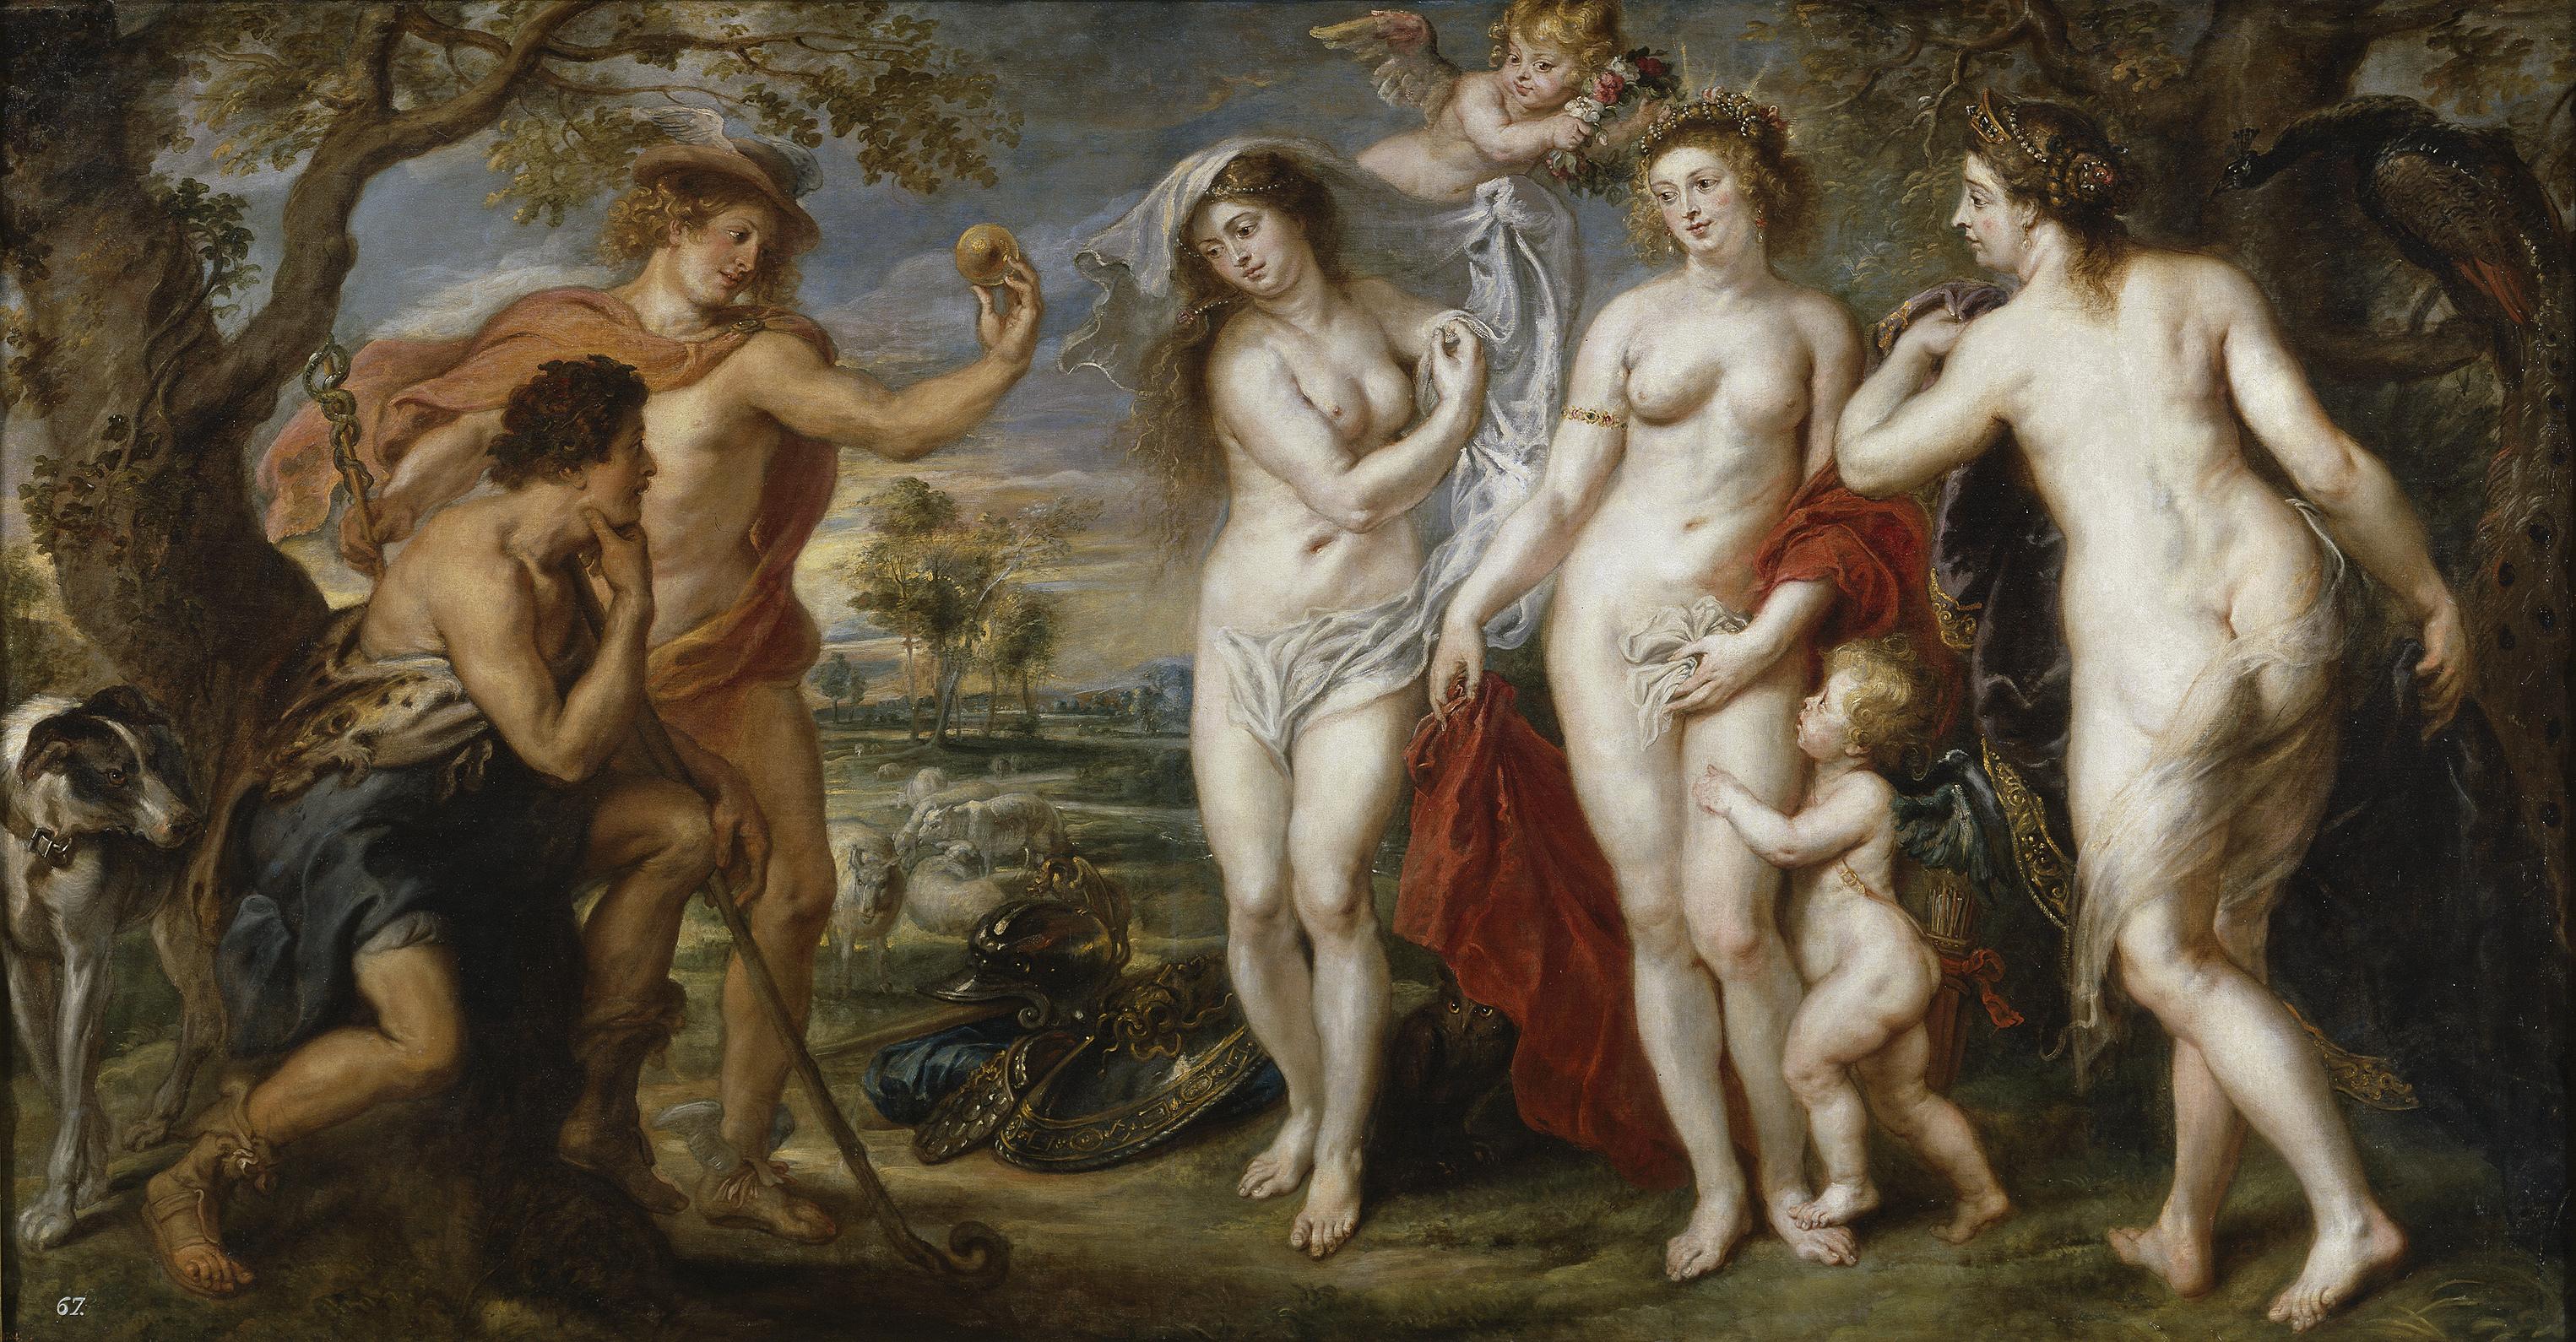 Peter Paul Rubens, 1577-1640. Суд Париса. 1638-1639. 199 х 381 см. Мадрид, Прадо